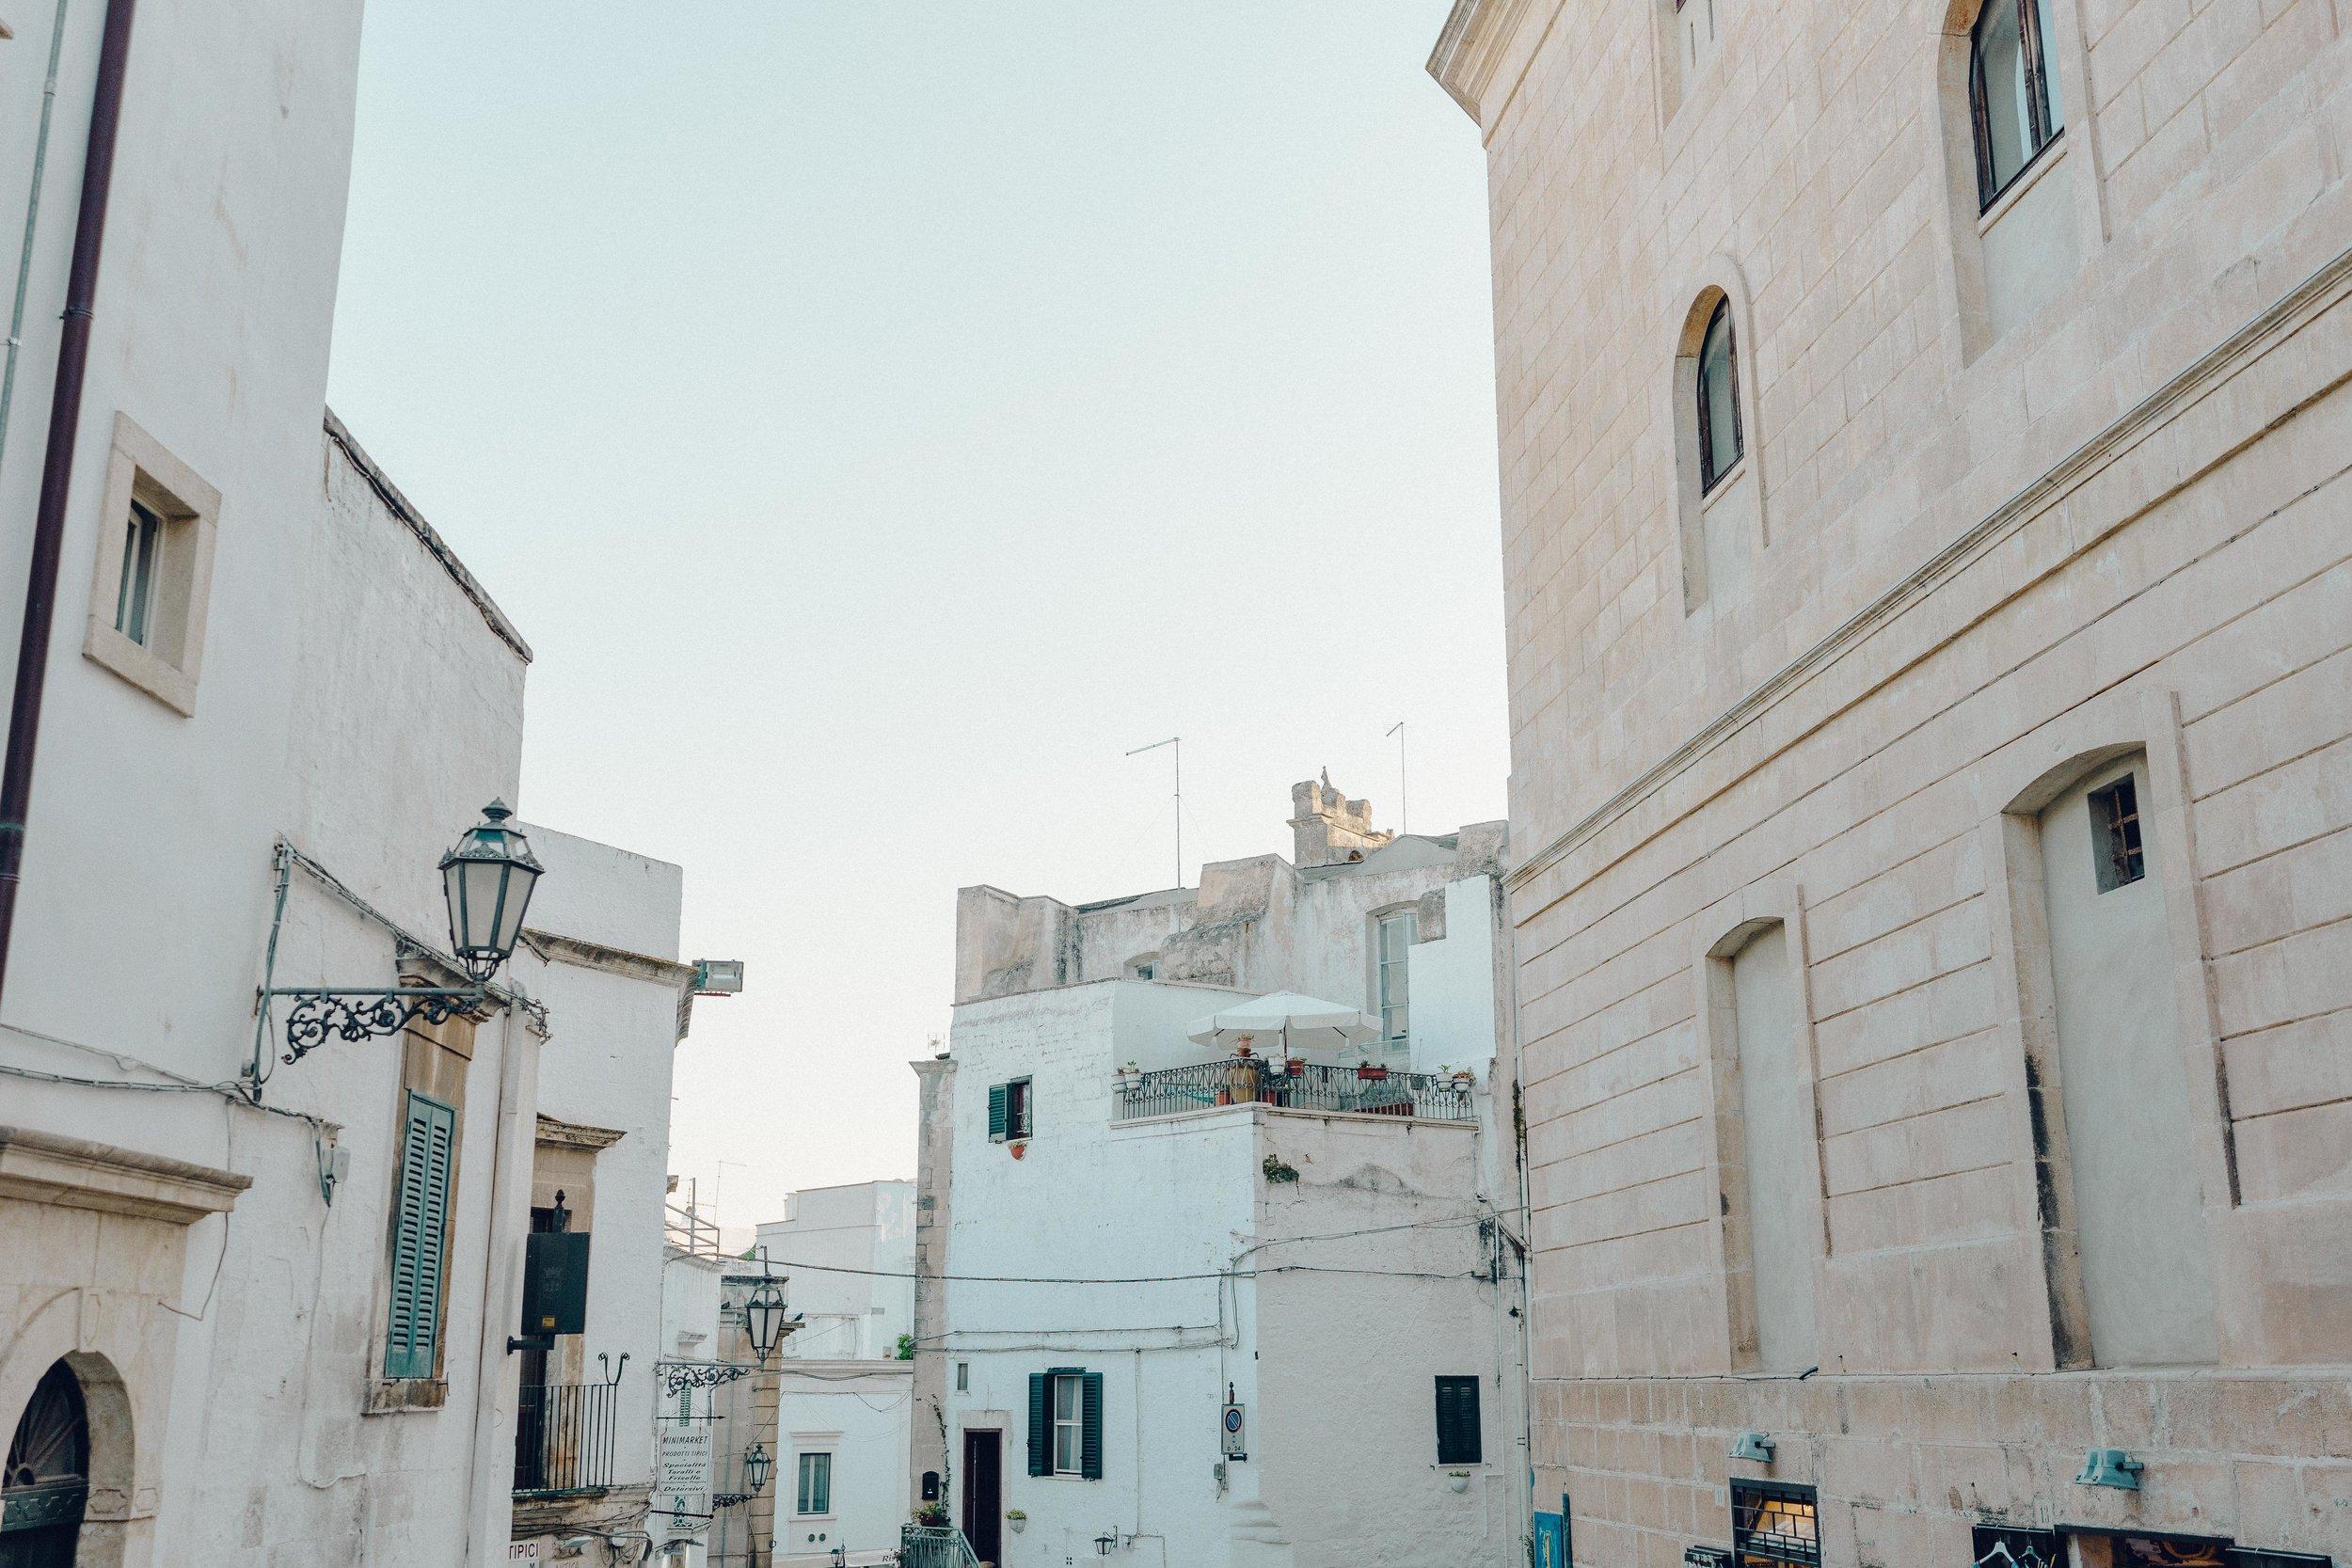 ASROSENVINGE_Roadtrip_Italy_Puglia_Zio_Ostuni-07338.jpg